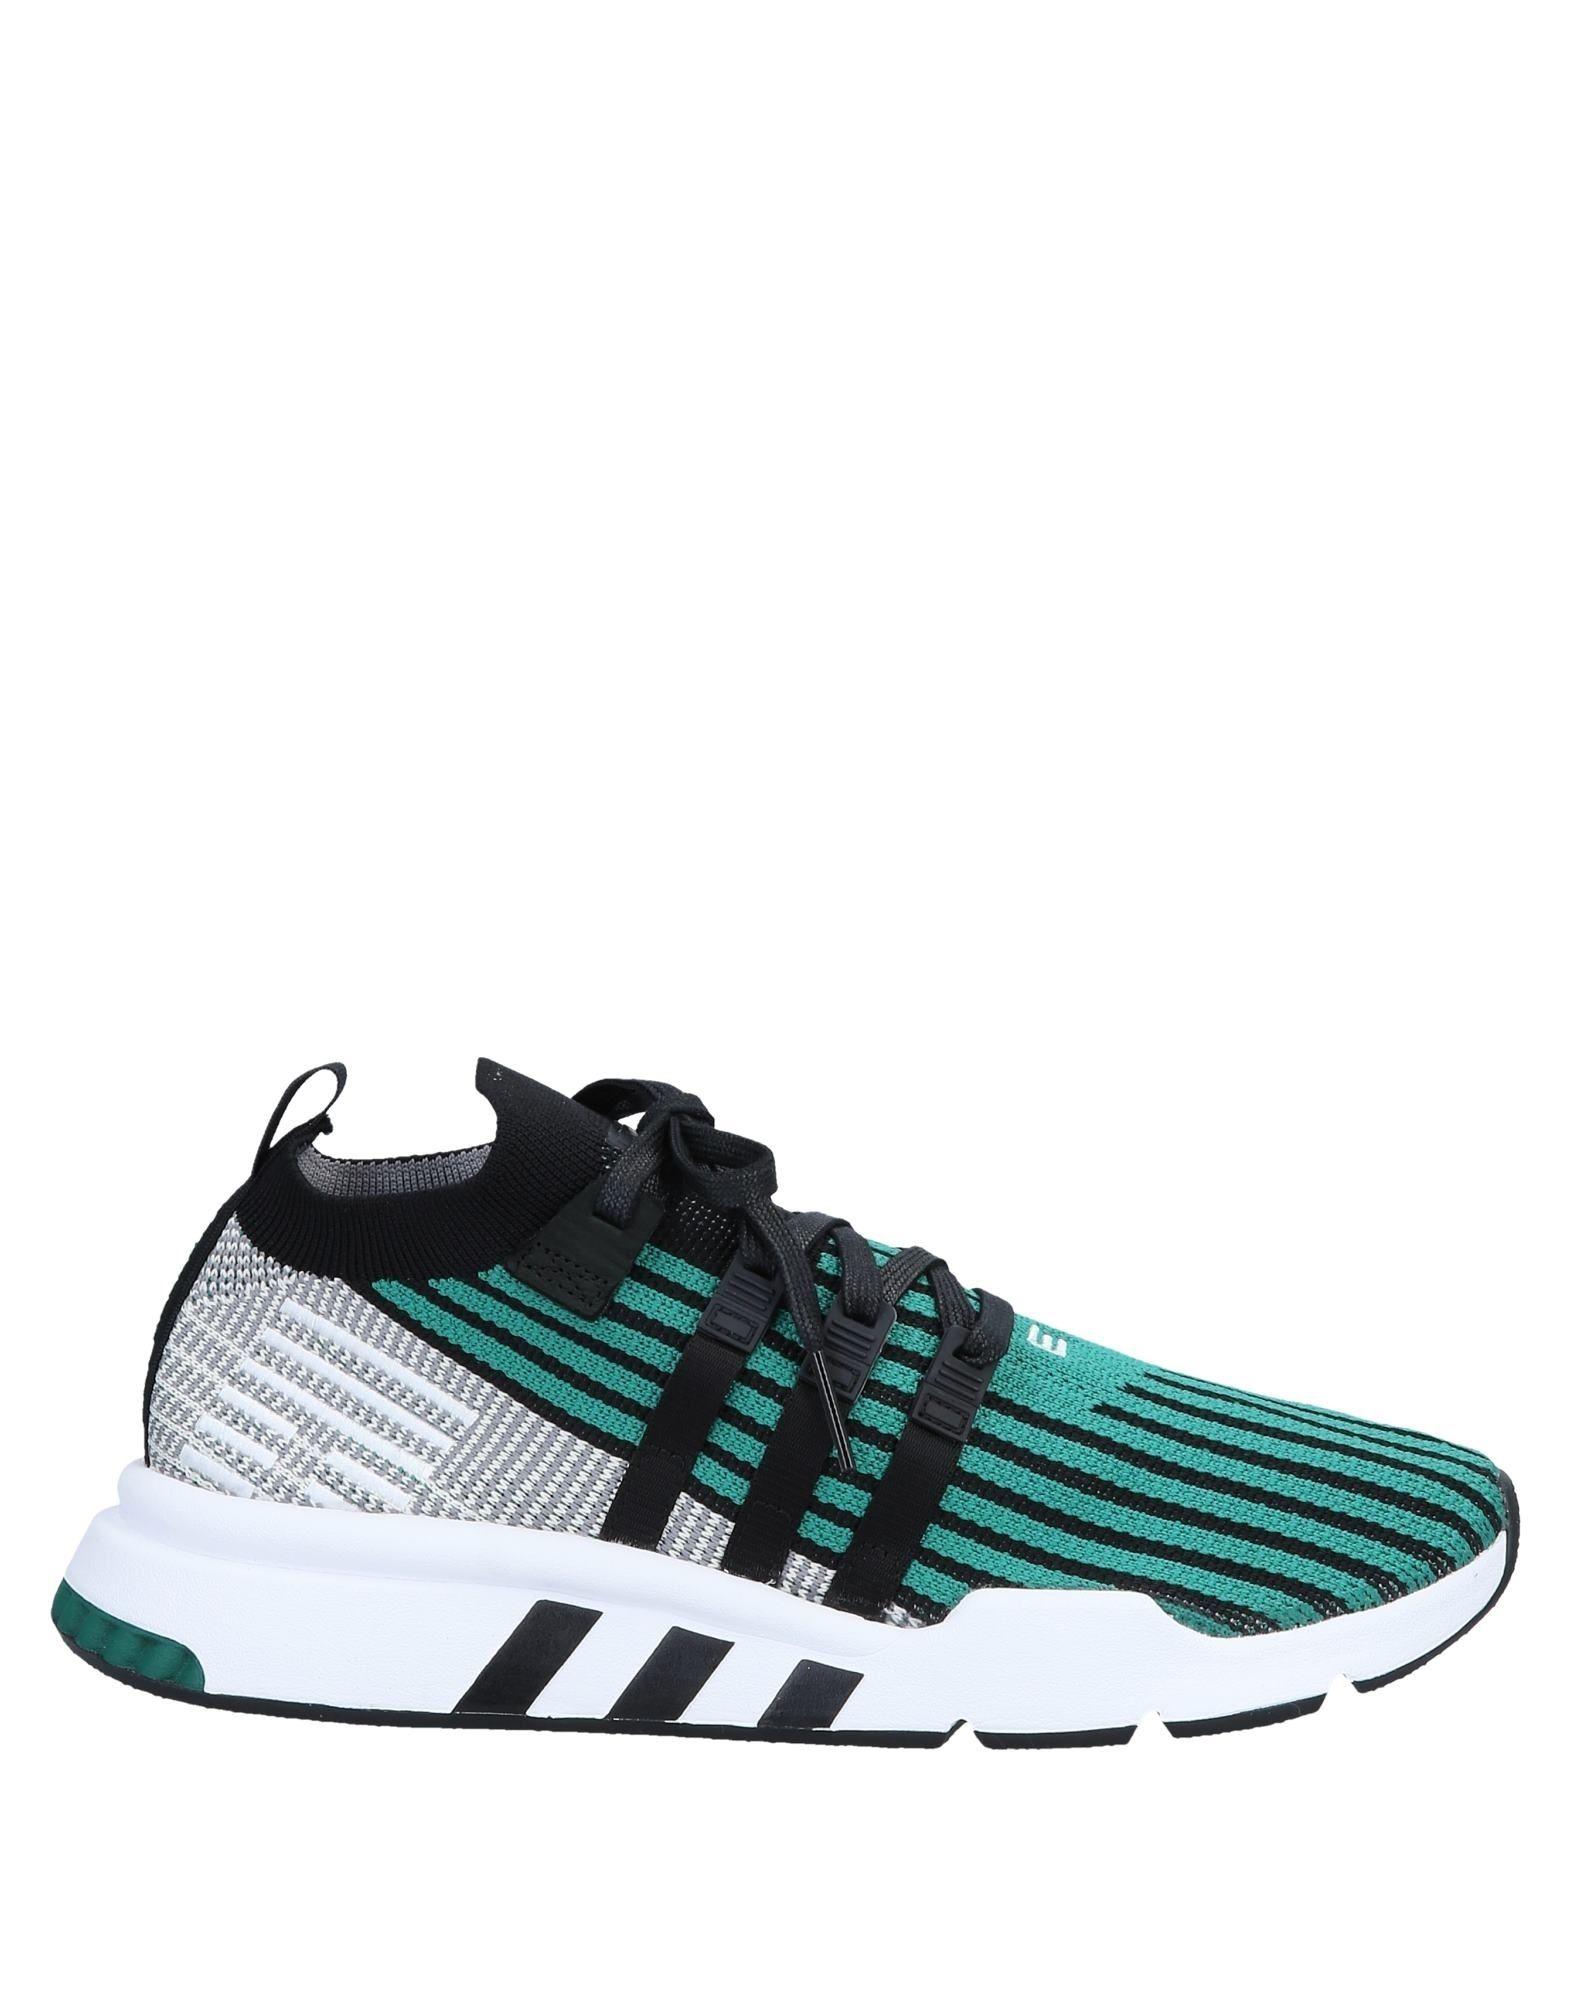 Adidas Originals Sneakers - Men on Adidas Originals Sneakers online on Men  United Kingdom - 11560727TA c24470